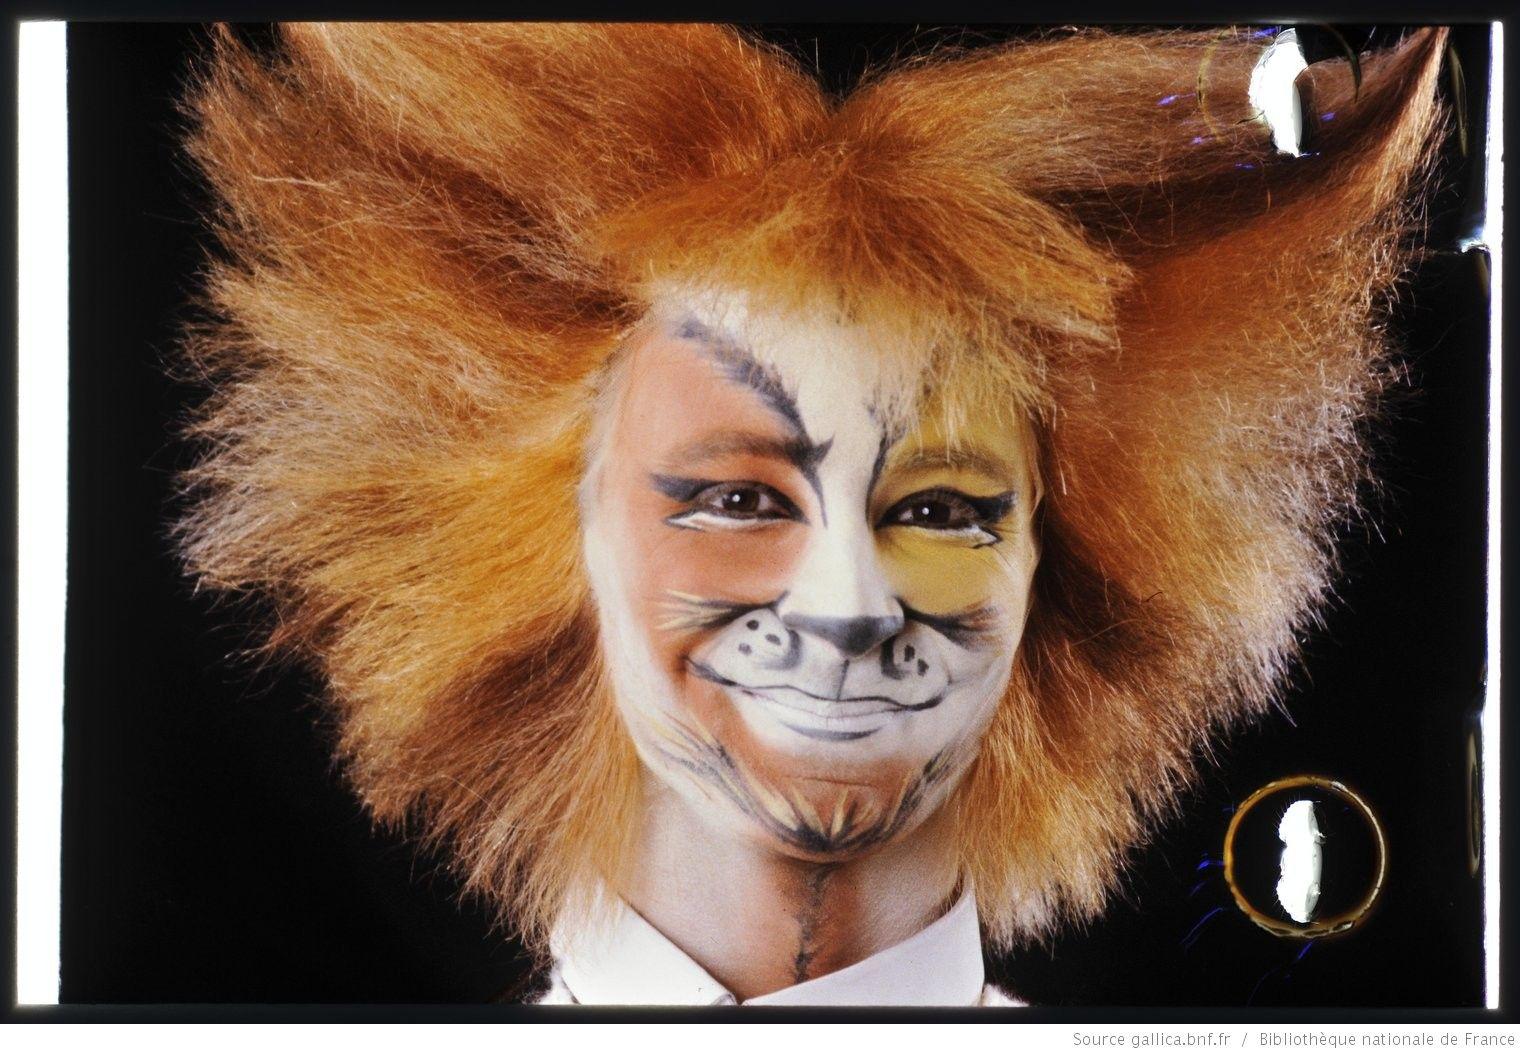 [Cats, musique de Andrew Lloyd Webber. (1989-1990) : photographies / Daniel Cande]